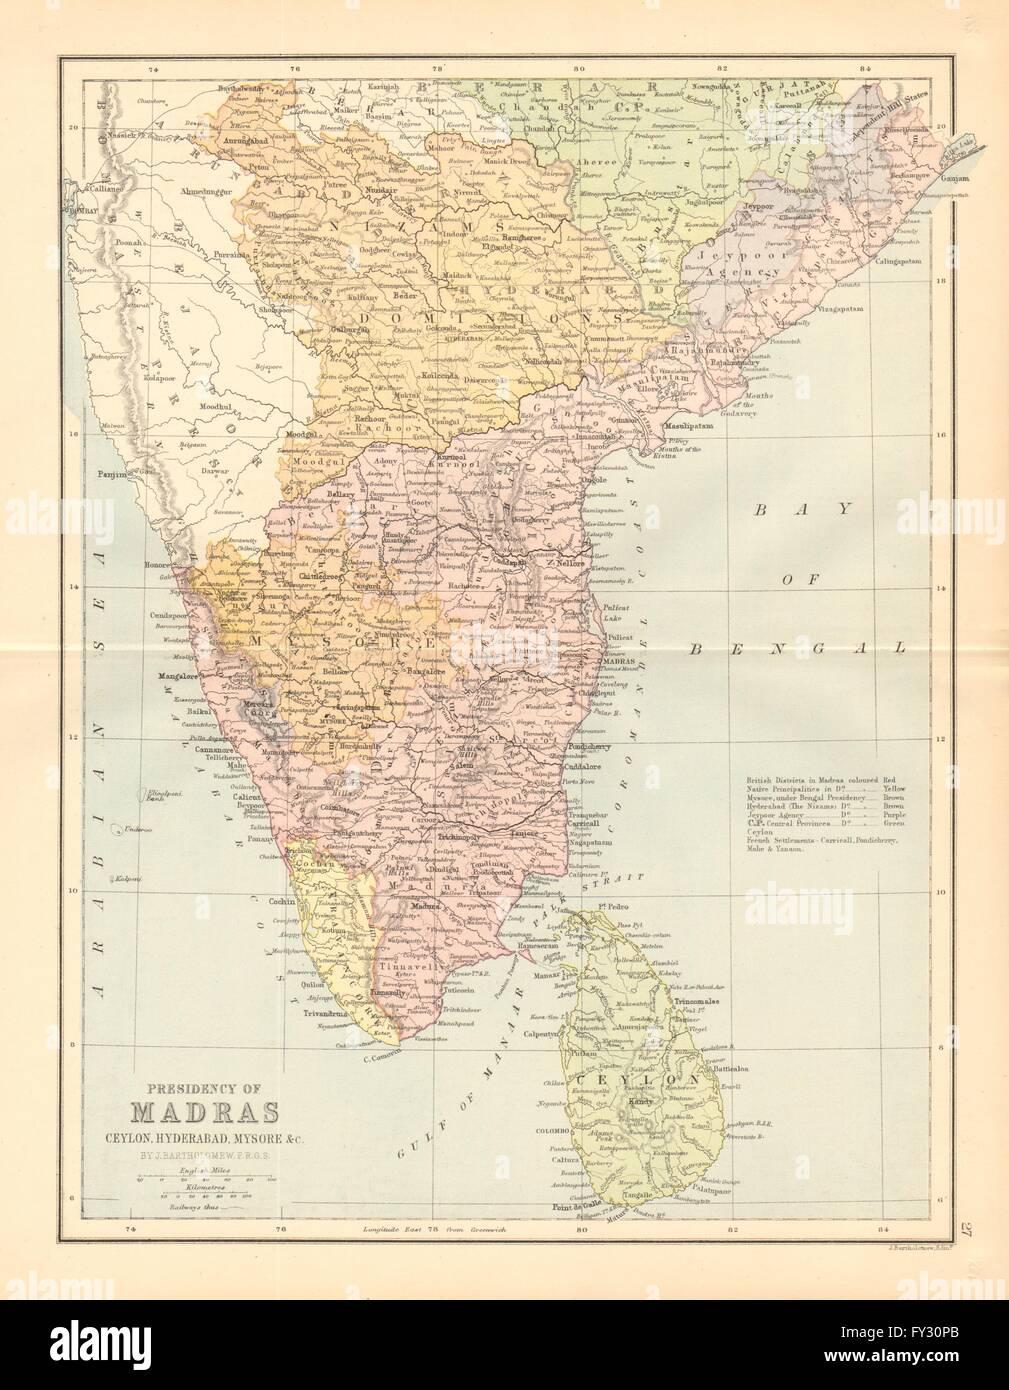 Madras India Map.British India South Madras Presidency Mysore Ceylon Coromandel